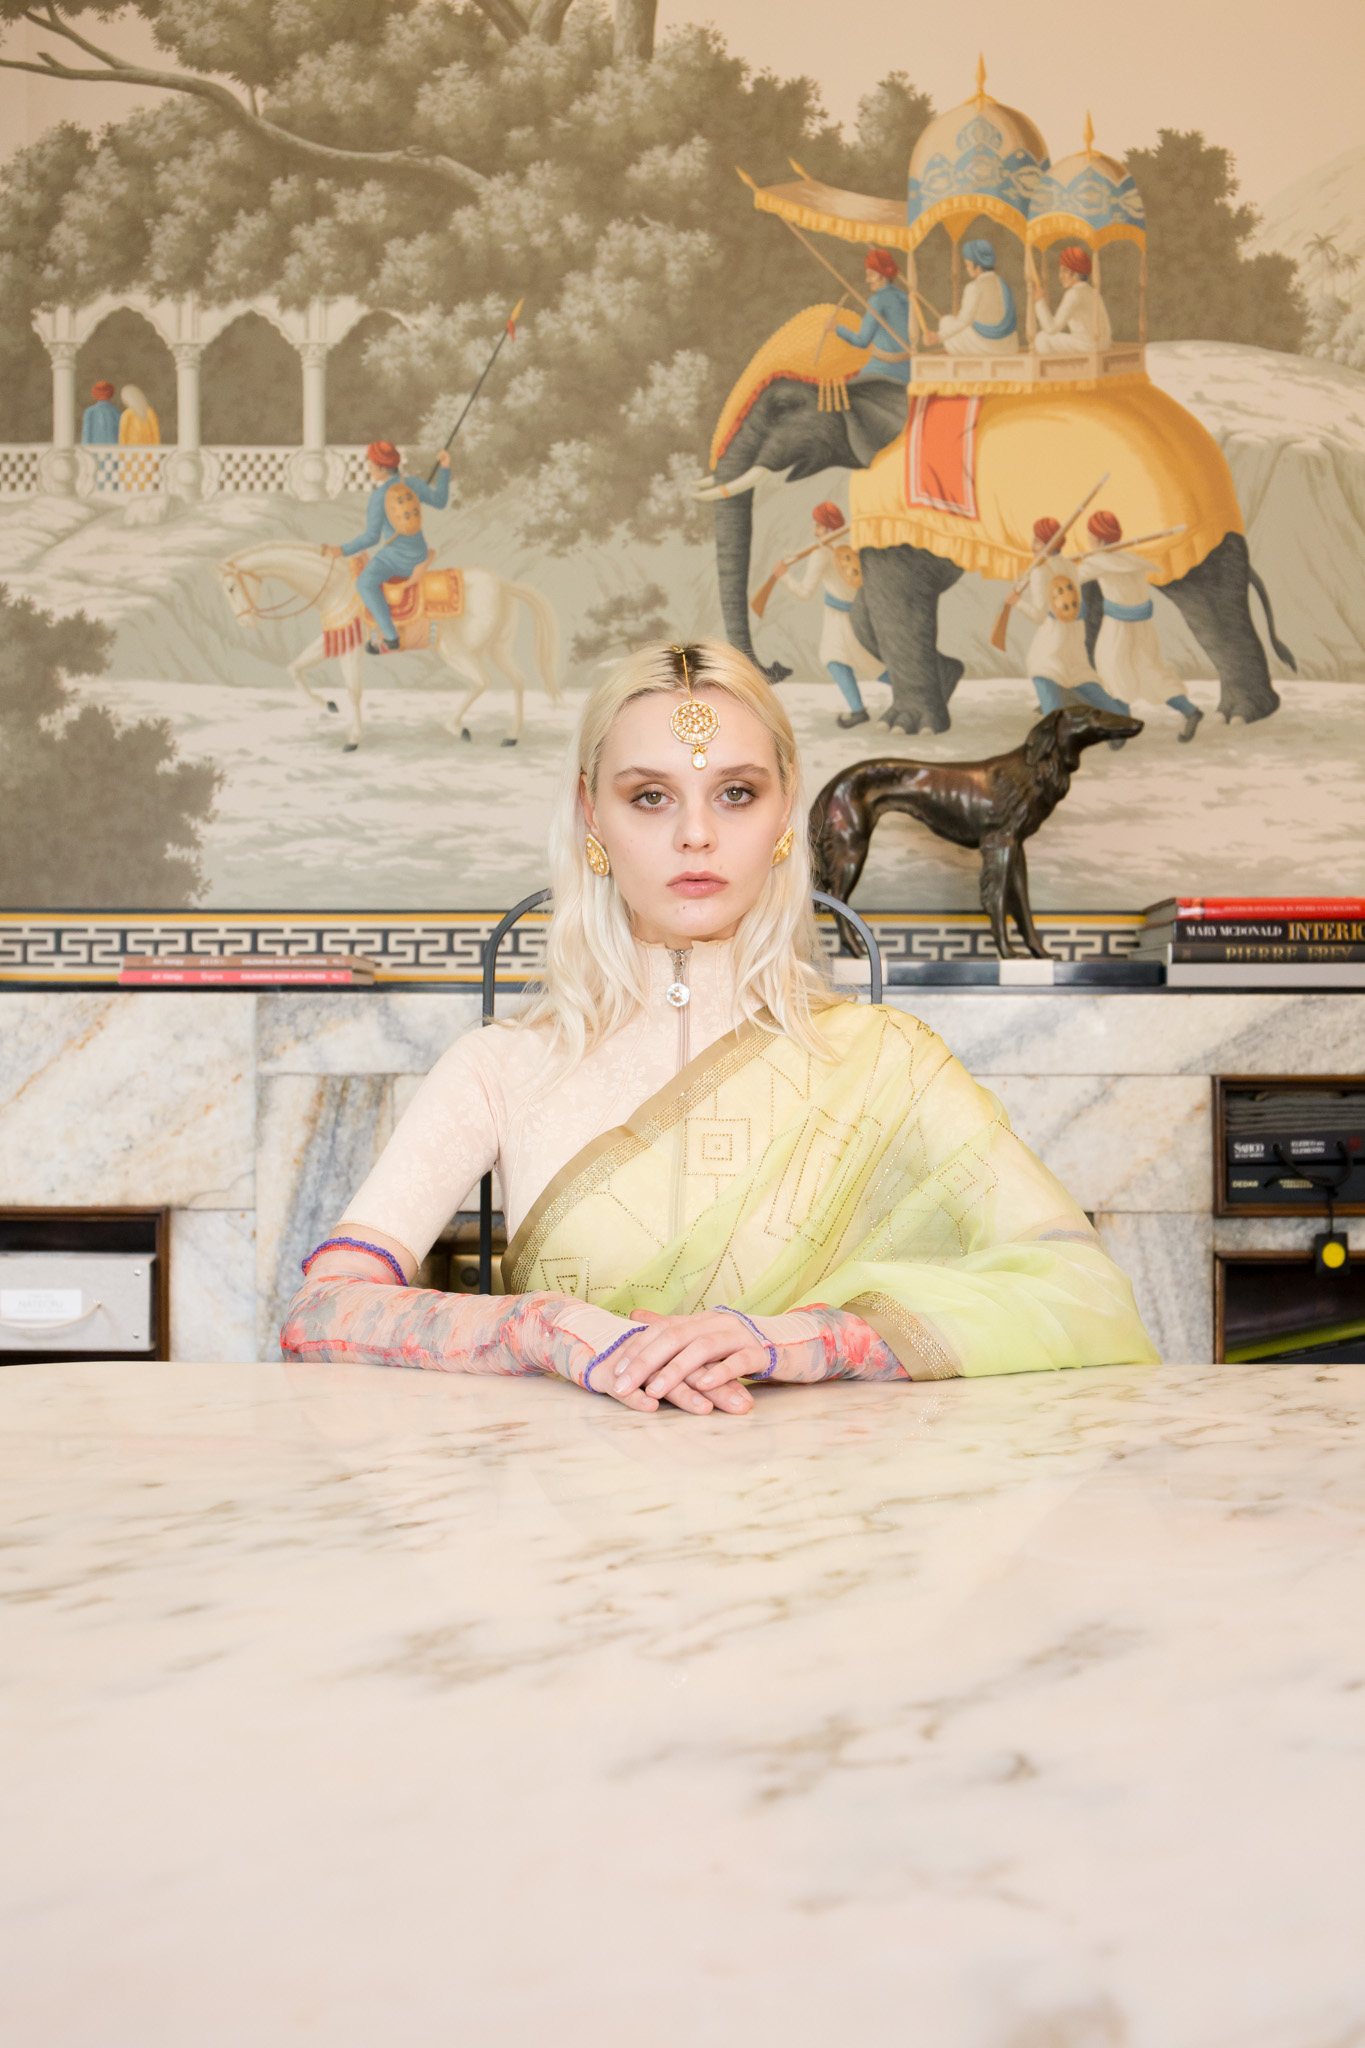 INDIA-AR-RFM-selezione-coeval-magazine_web-social-1.jpg